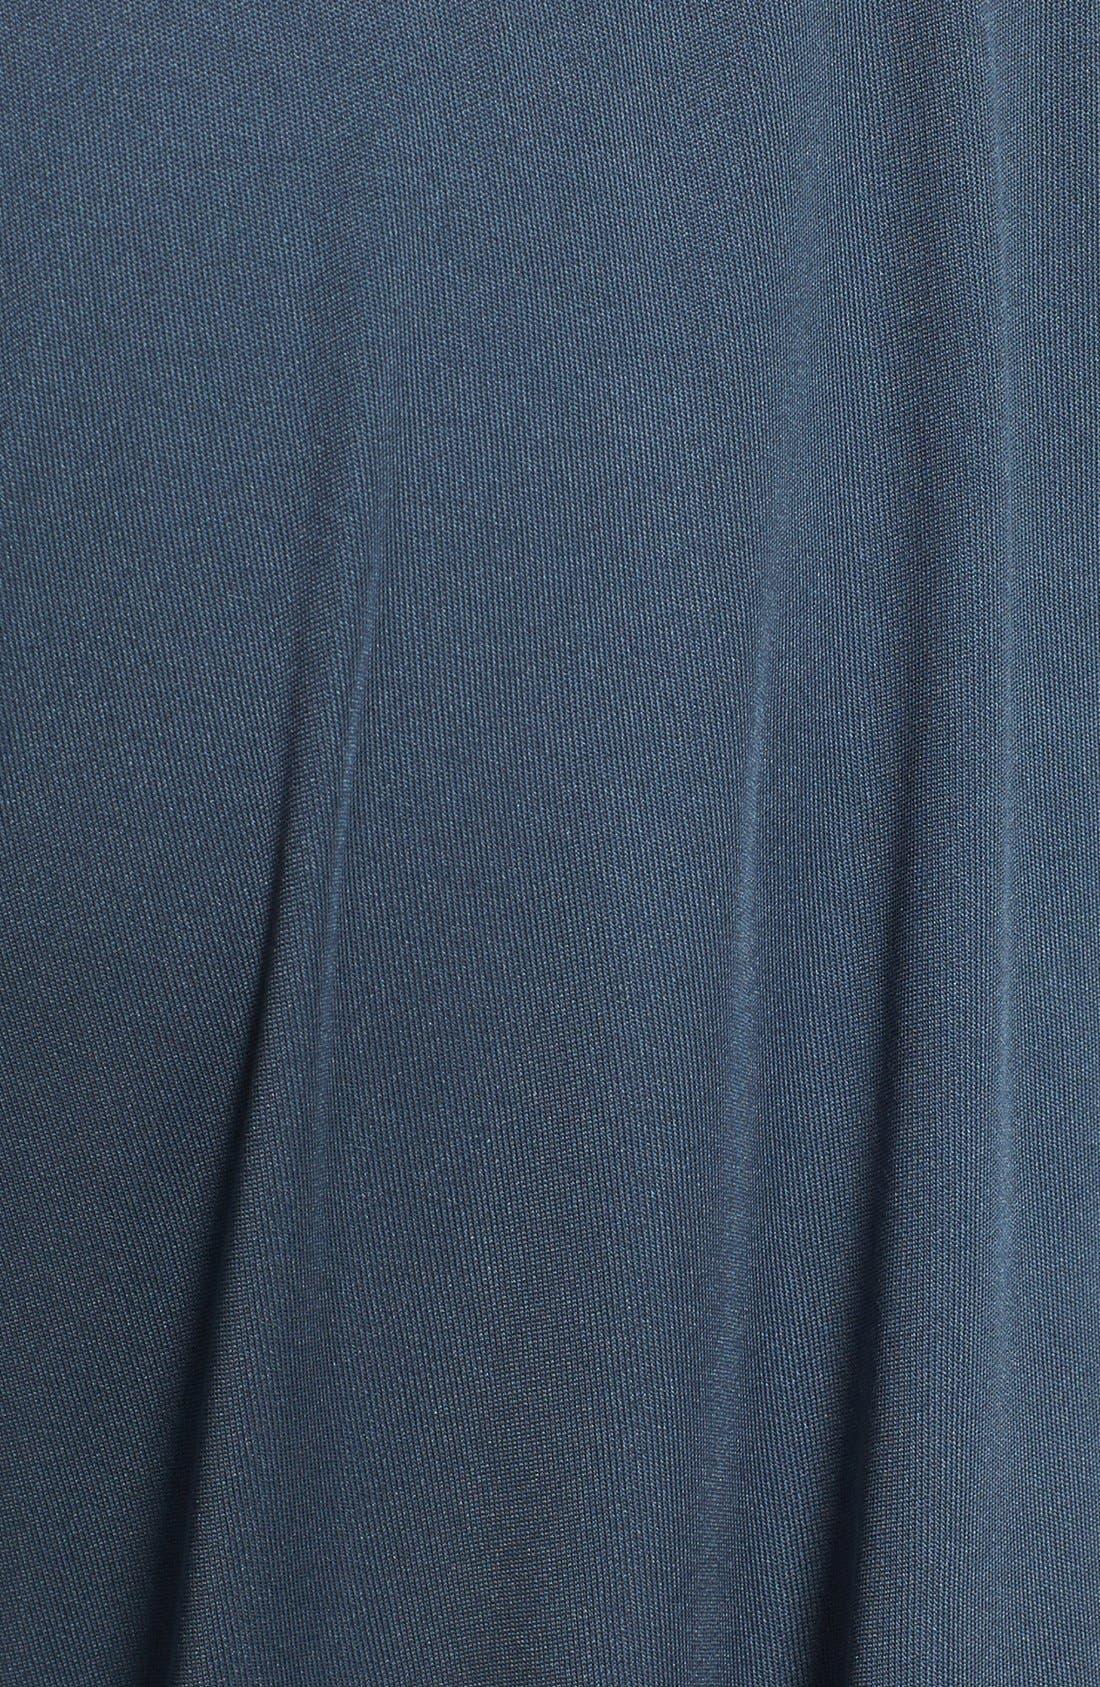 Alternate Image 3  - adidas 'Ultimate Swat' Shorts